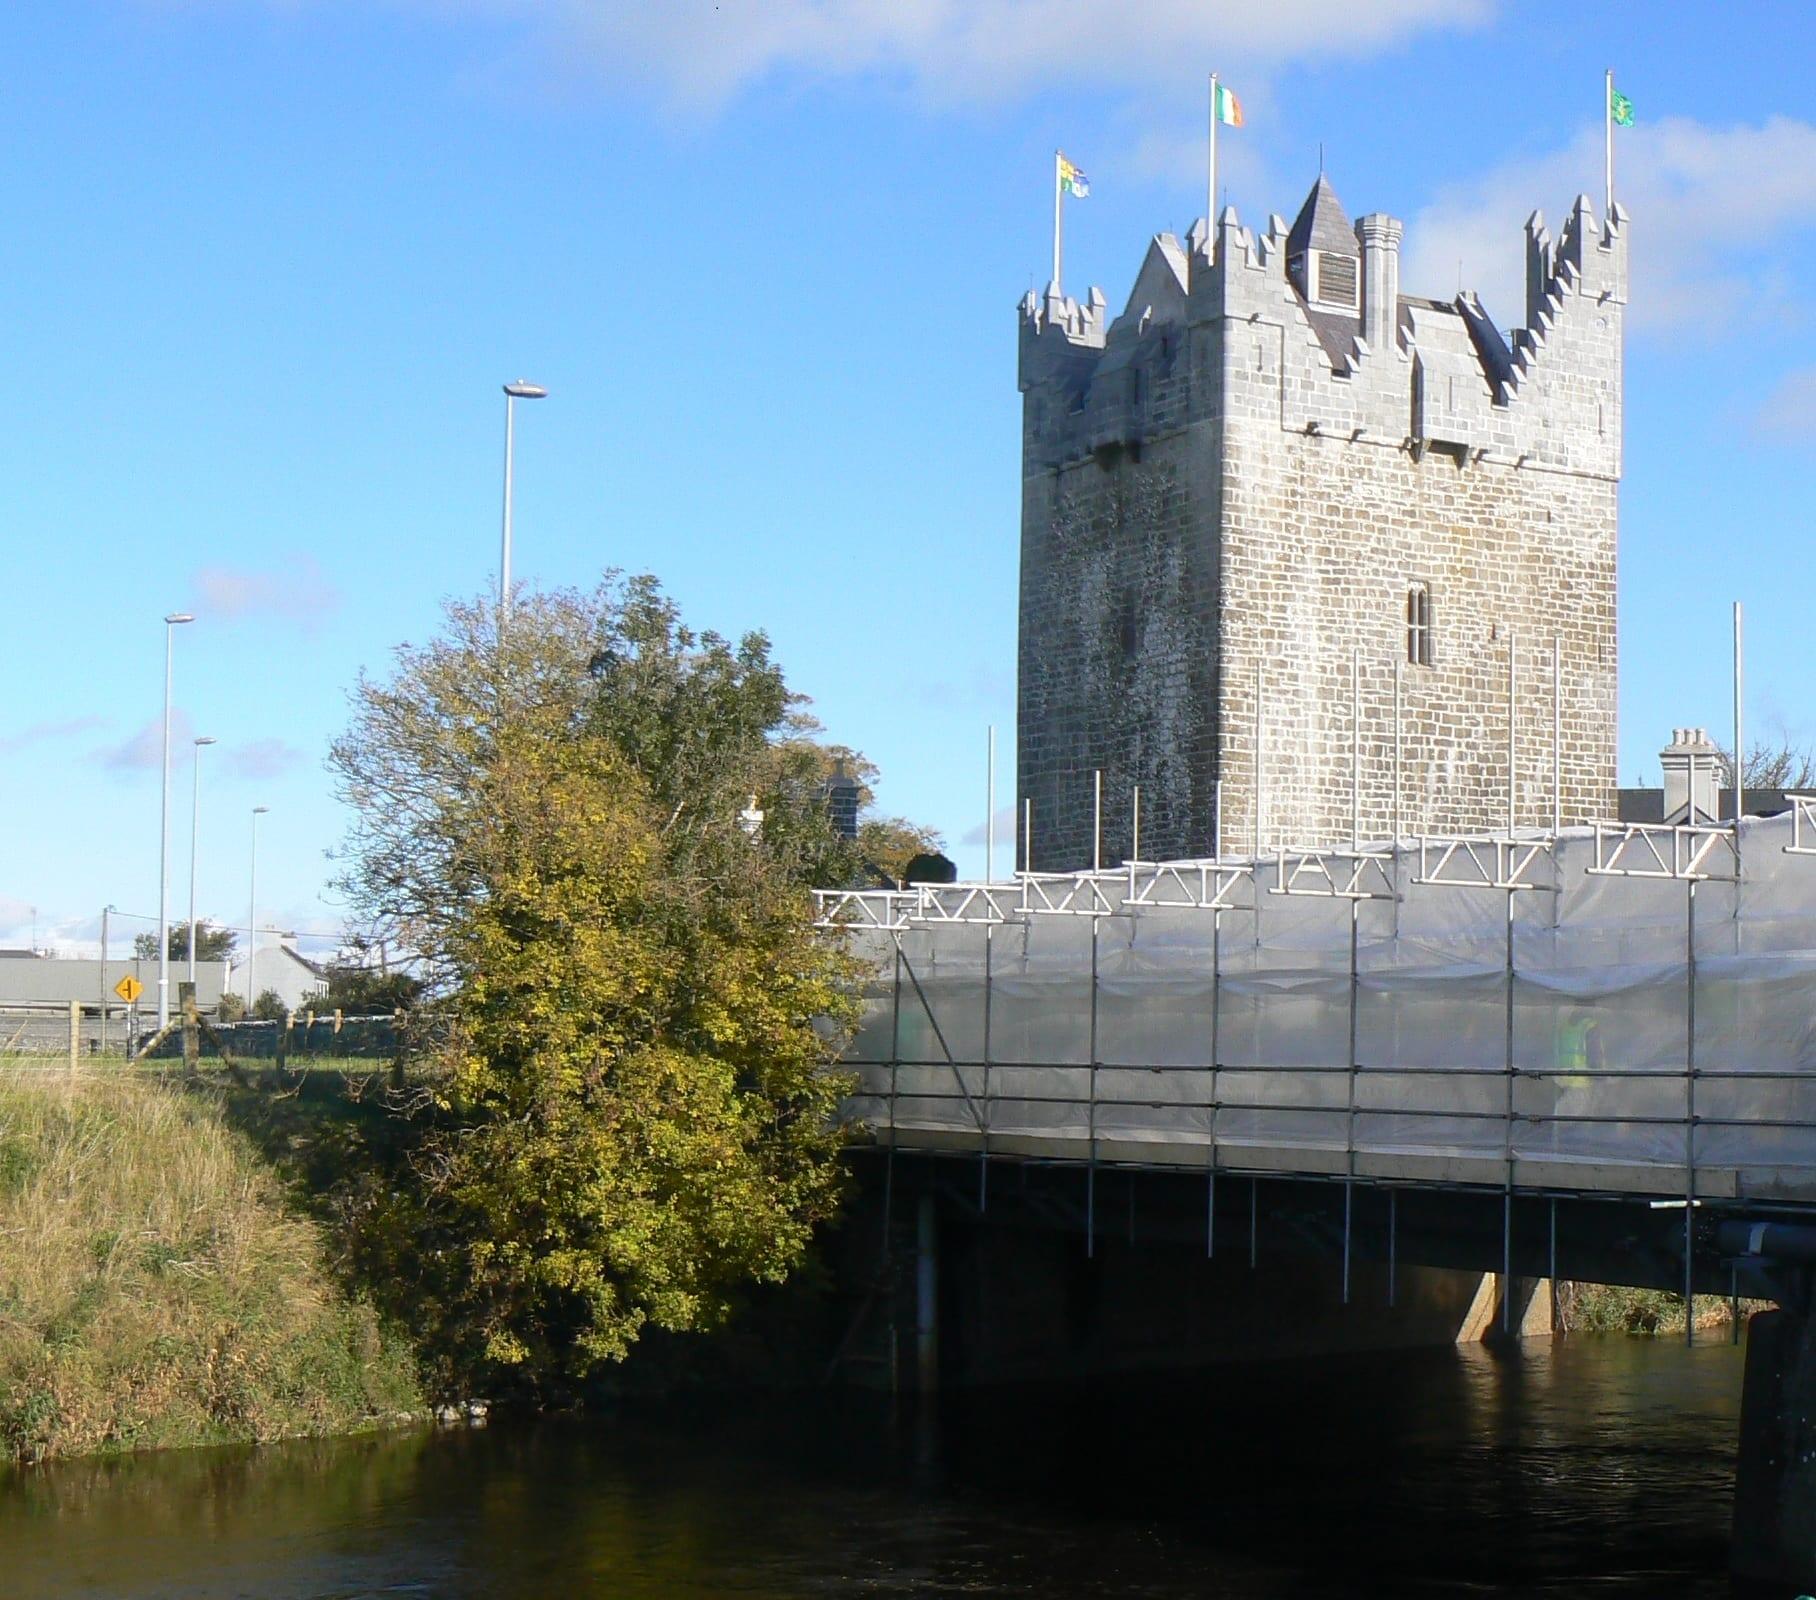 glenarm bridge Featured Image